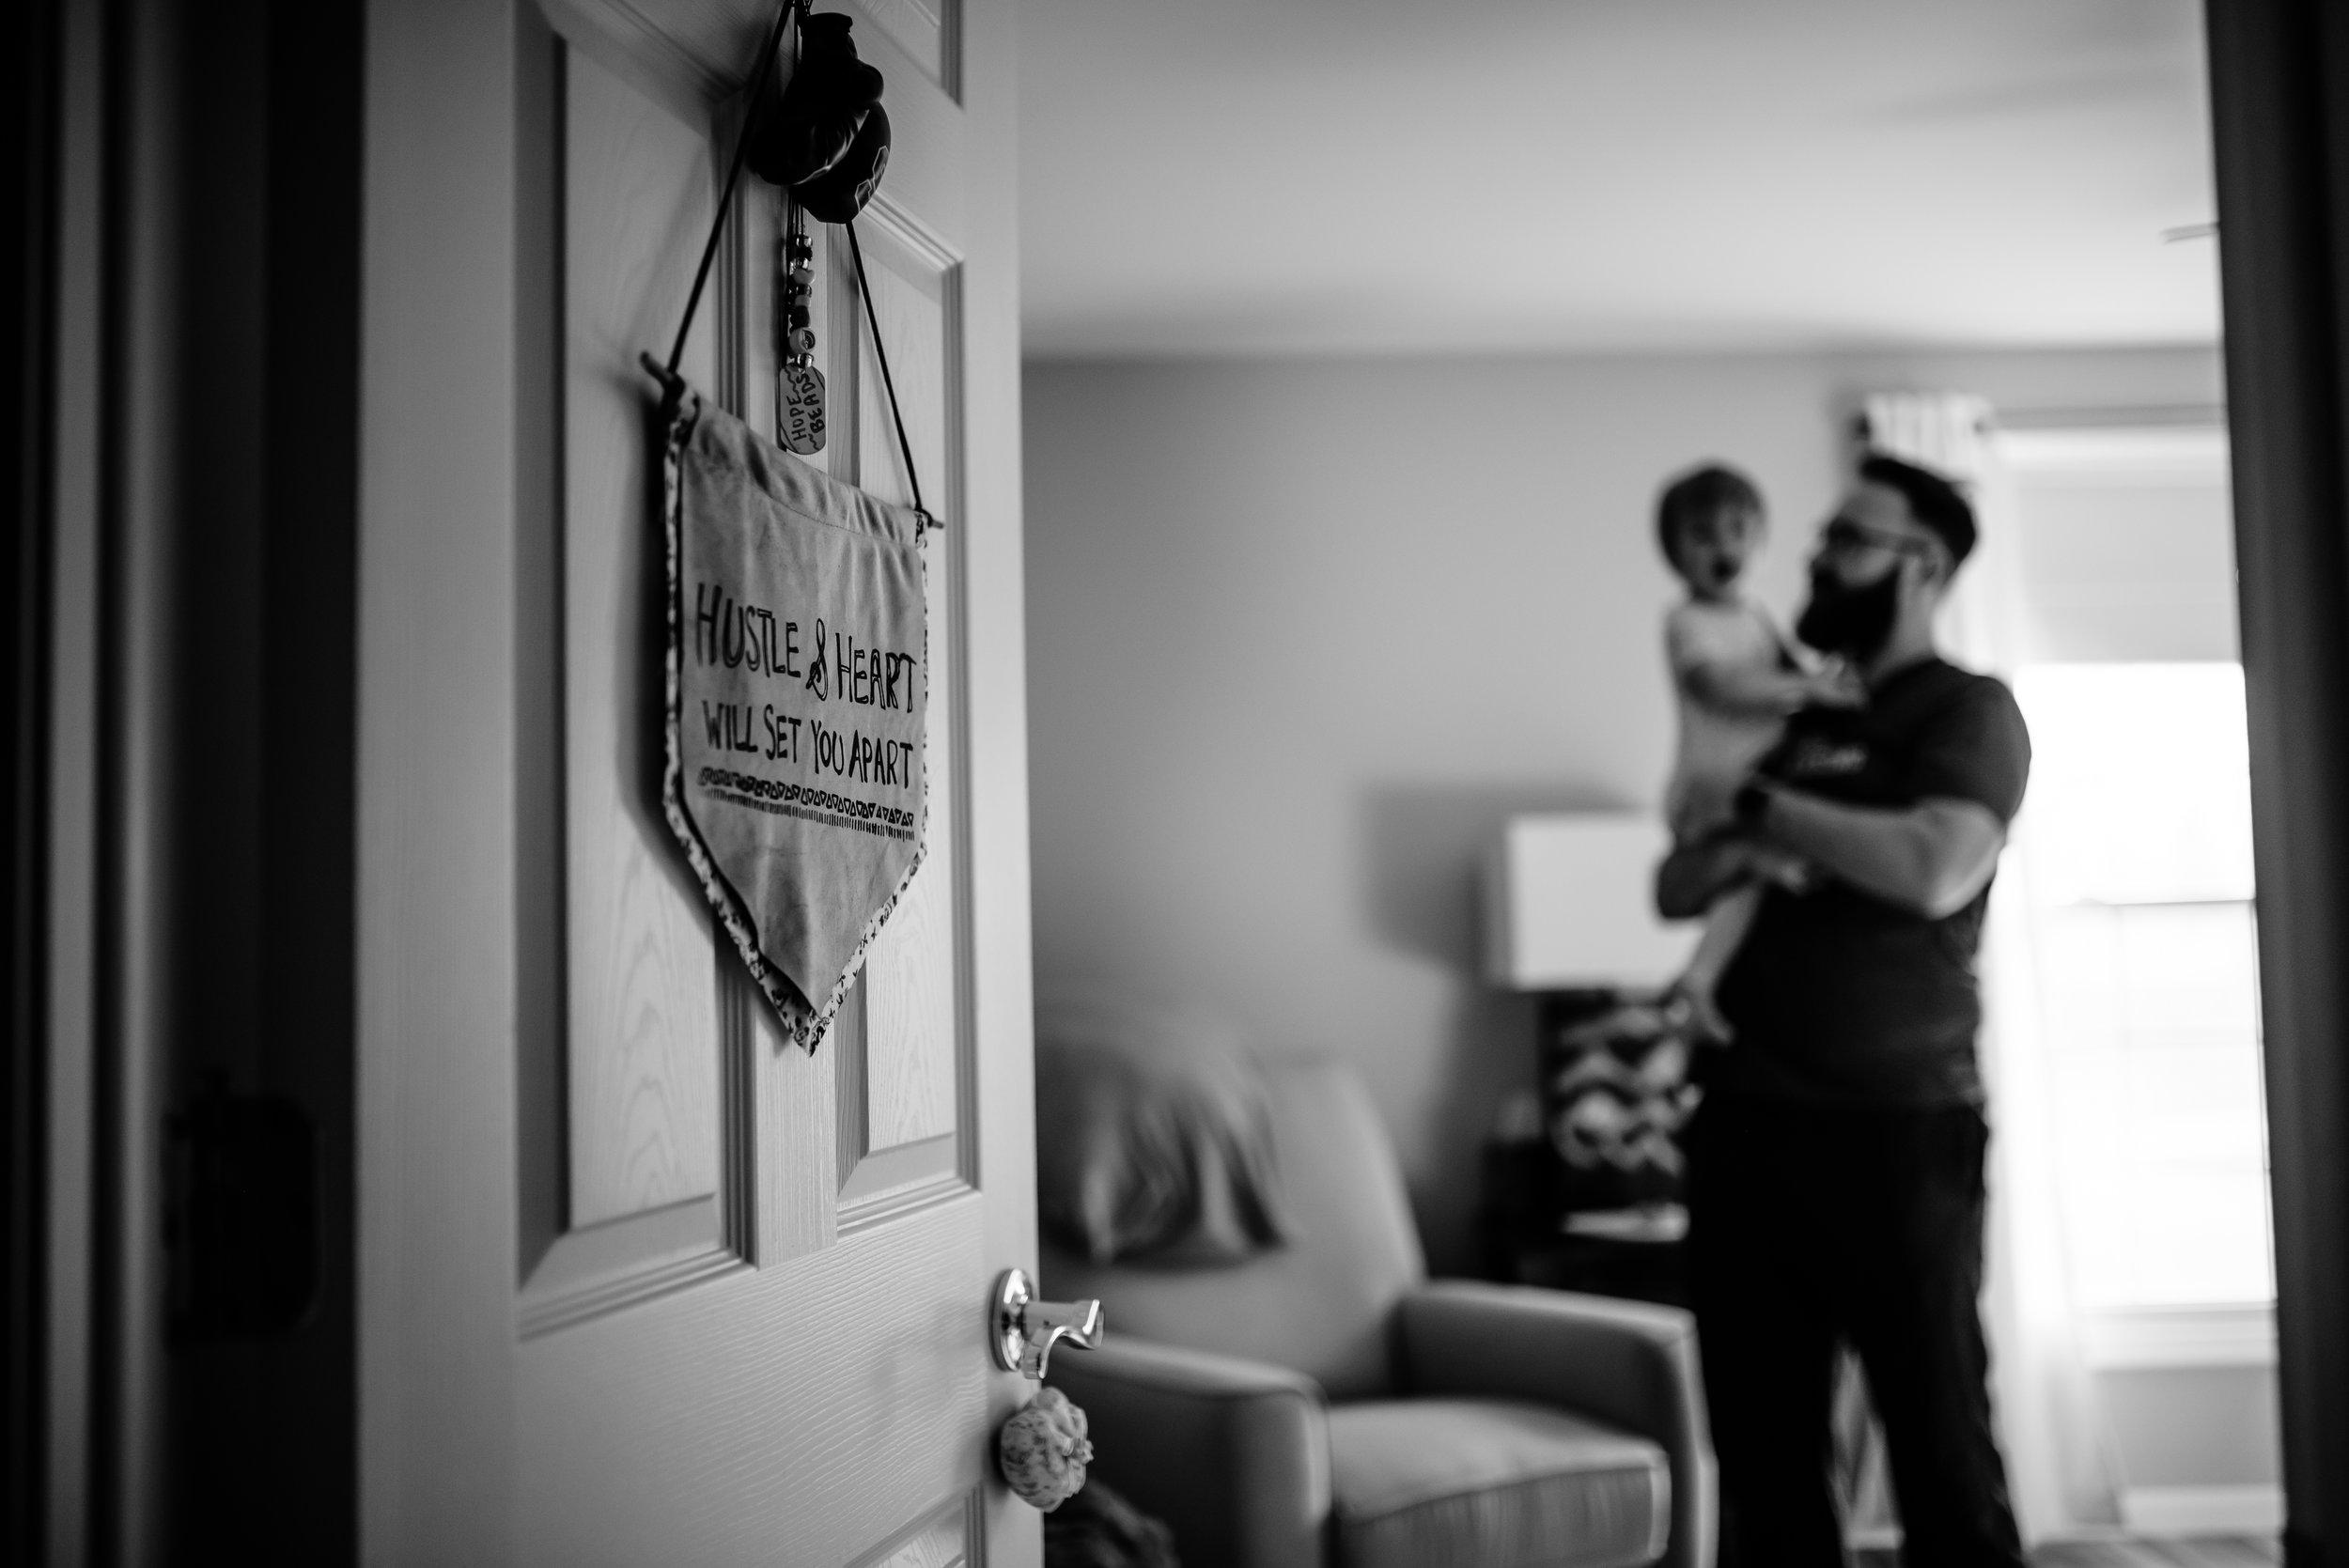 Dad holds daughter in her room, with cute sign on bedroom door